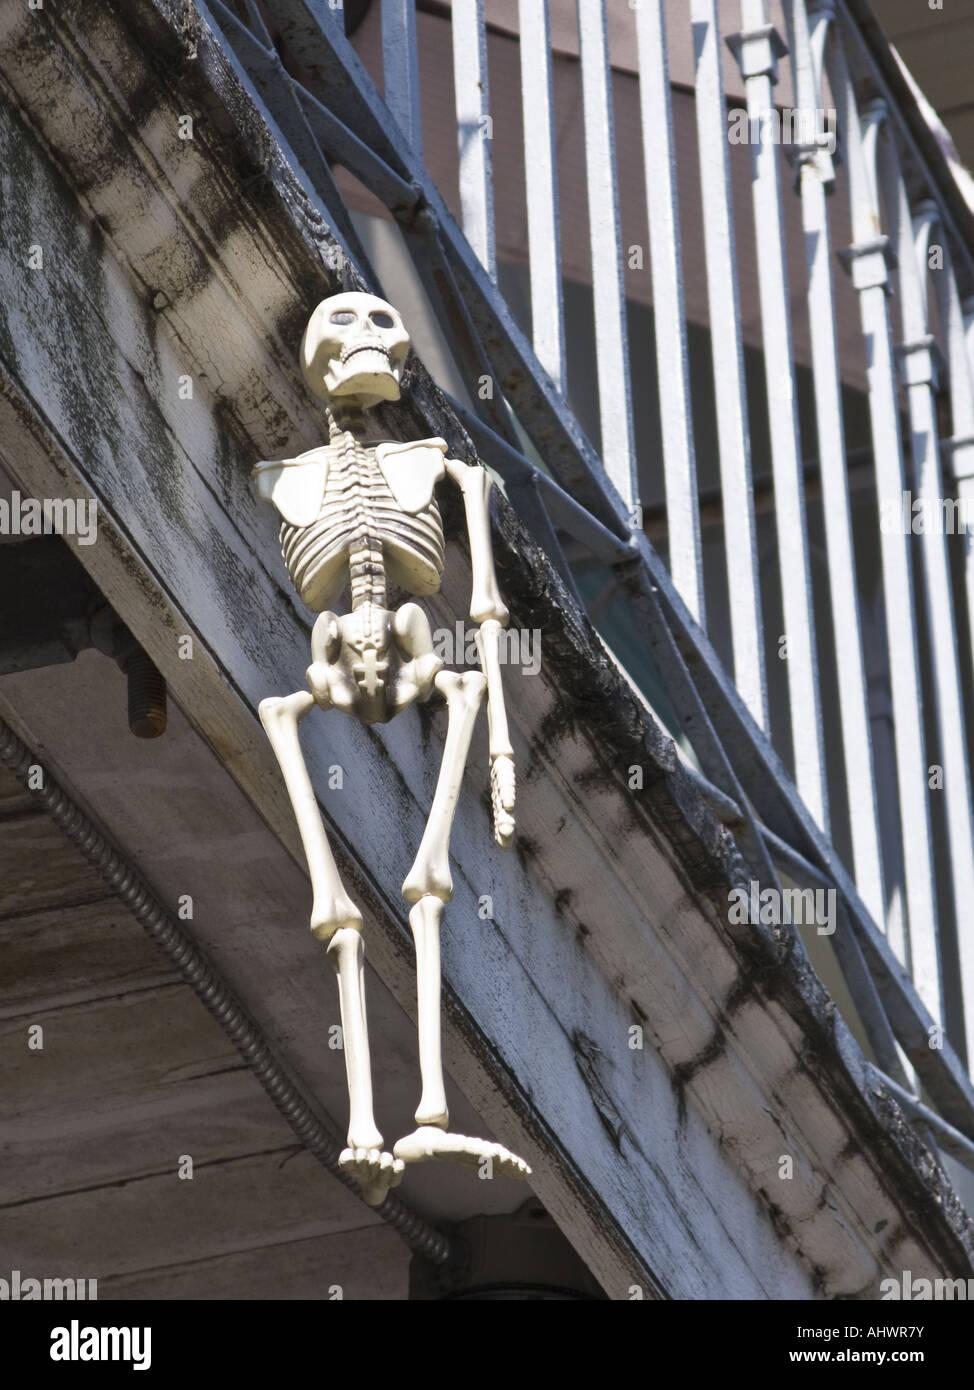 Skeleton hanging from Balcony - Stock Image